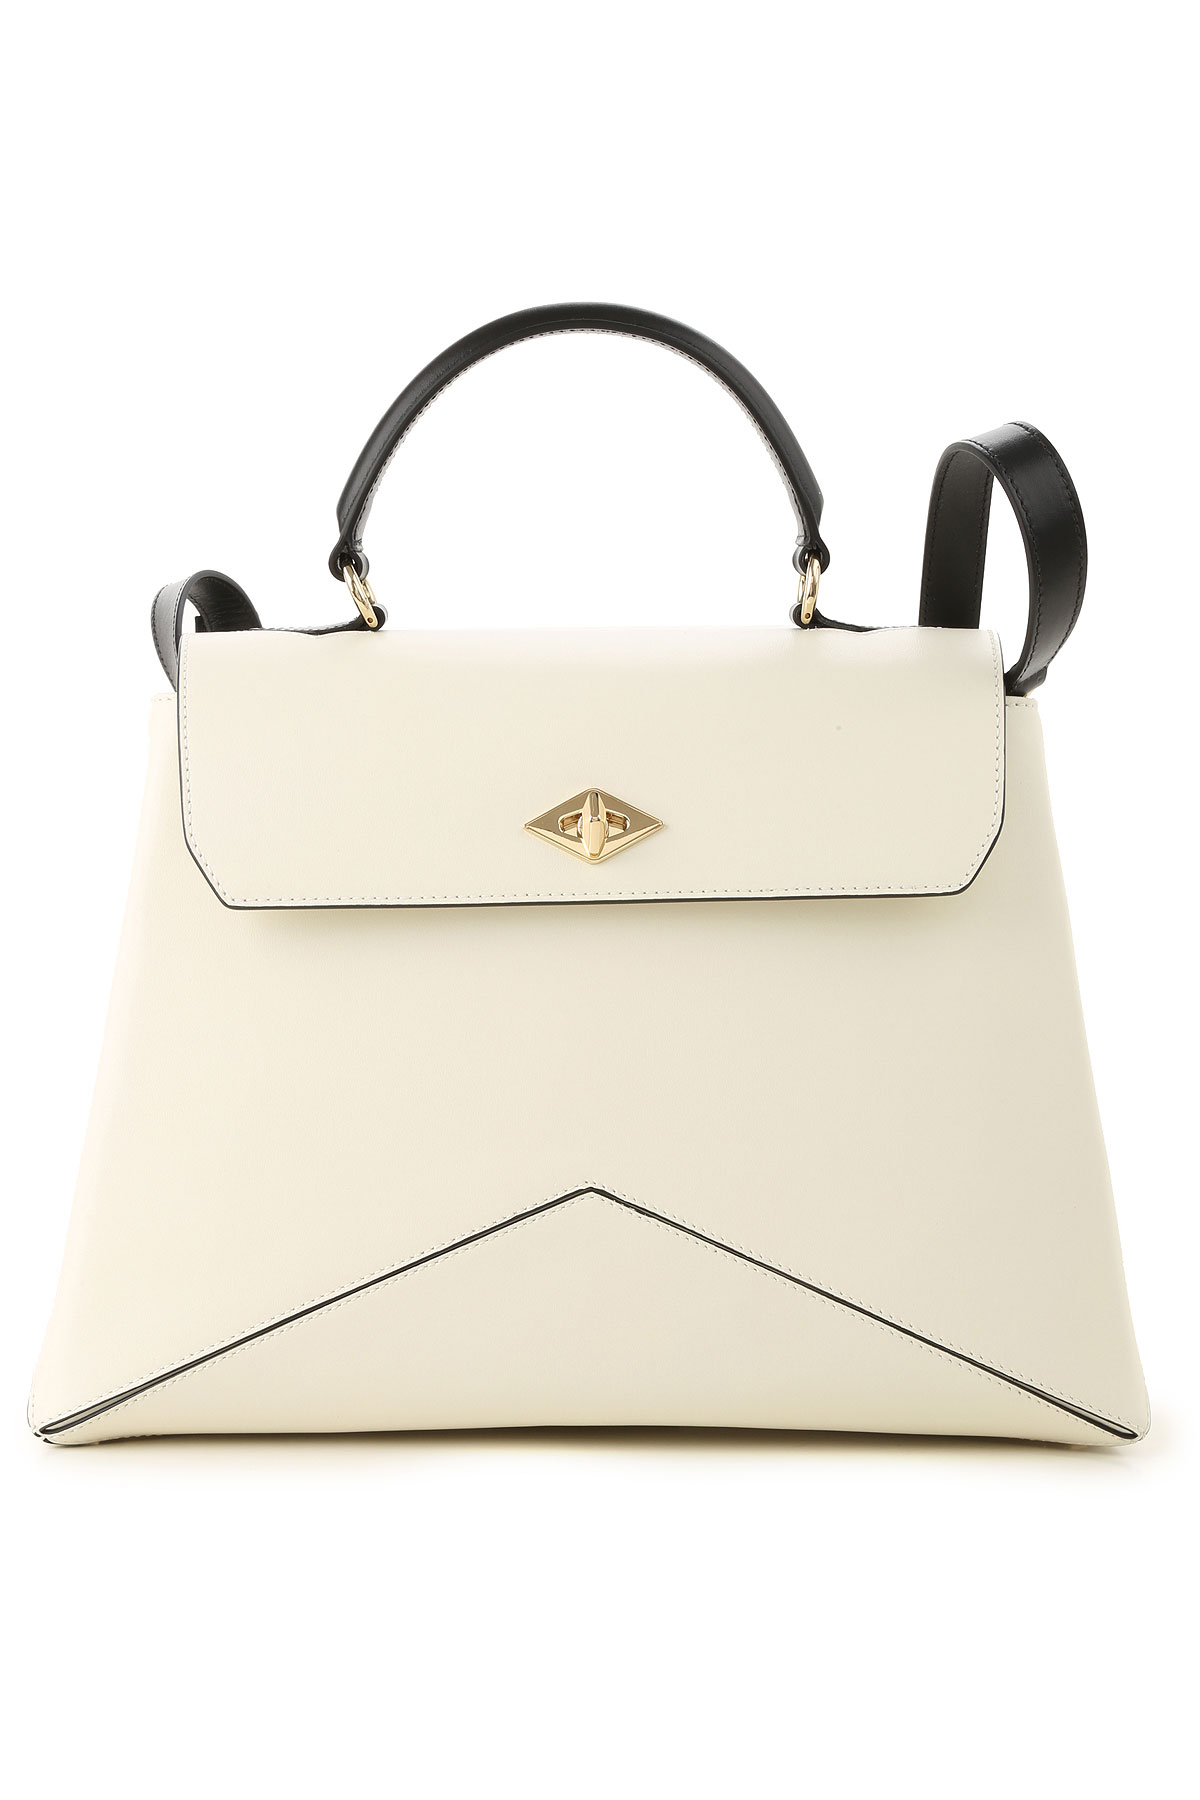 Image of Ballantyne Handbags, White, Leather, 2017